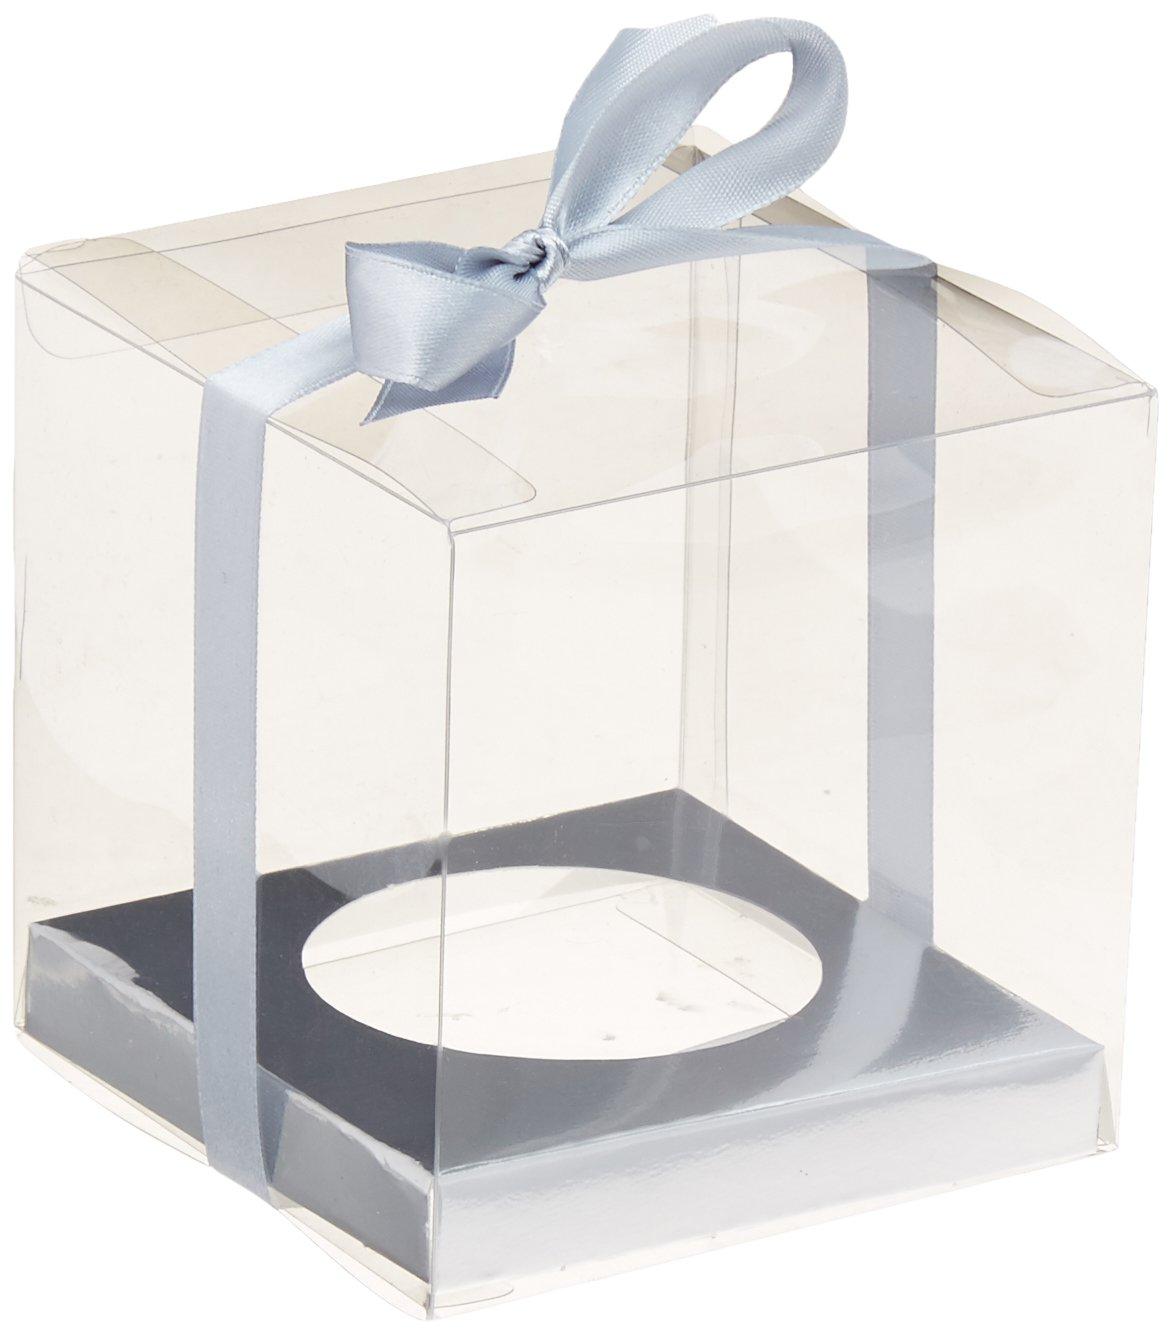 Amscan 380020.18 Party Boxes Multi Sizes Silver